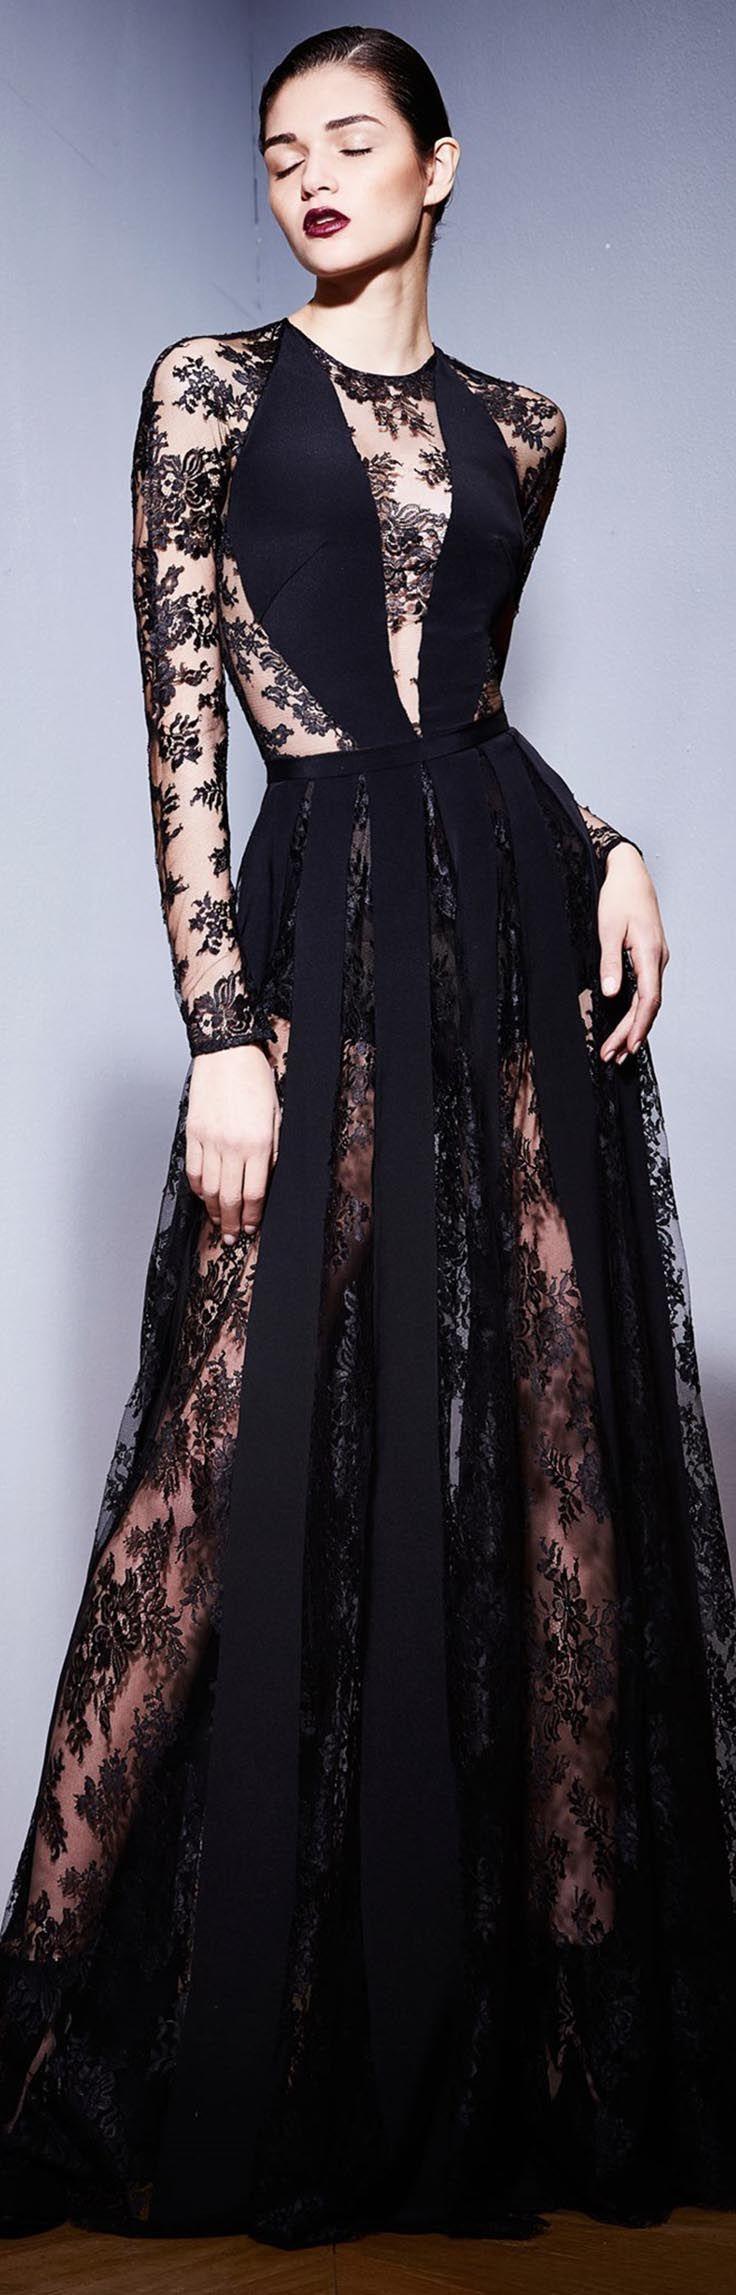 stunning wedding dresses 2016 lace ballgown princesses strapless 2017aa